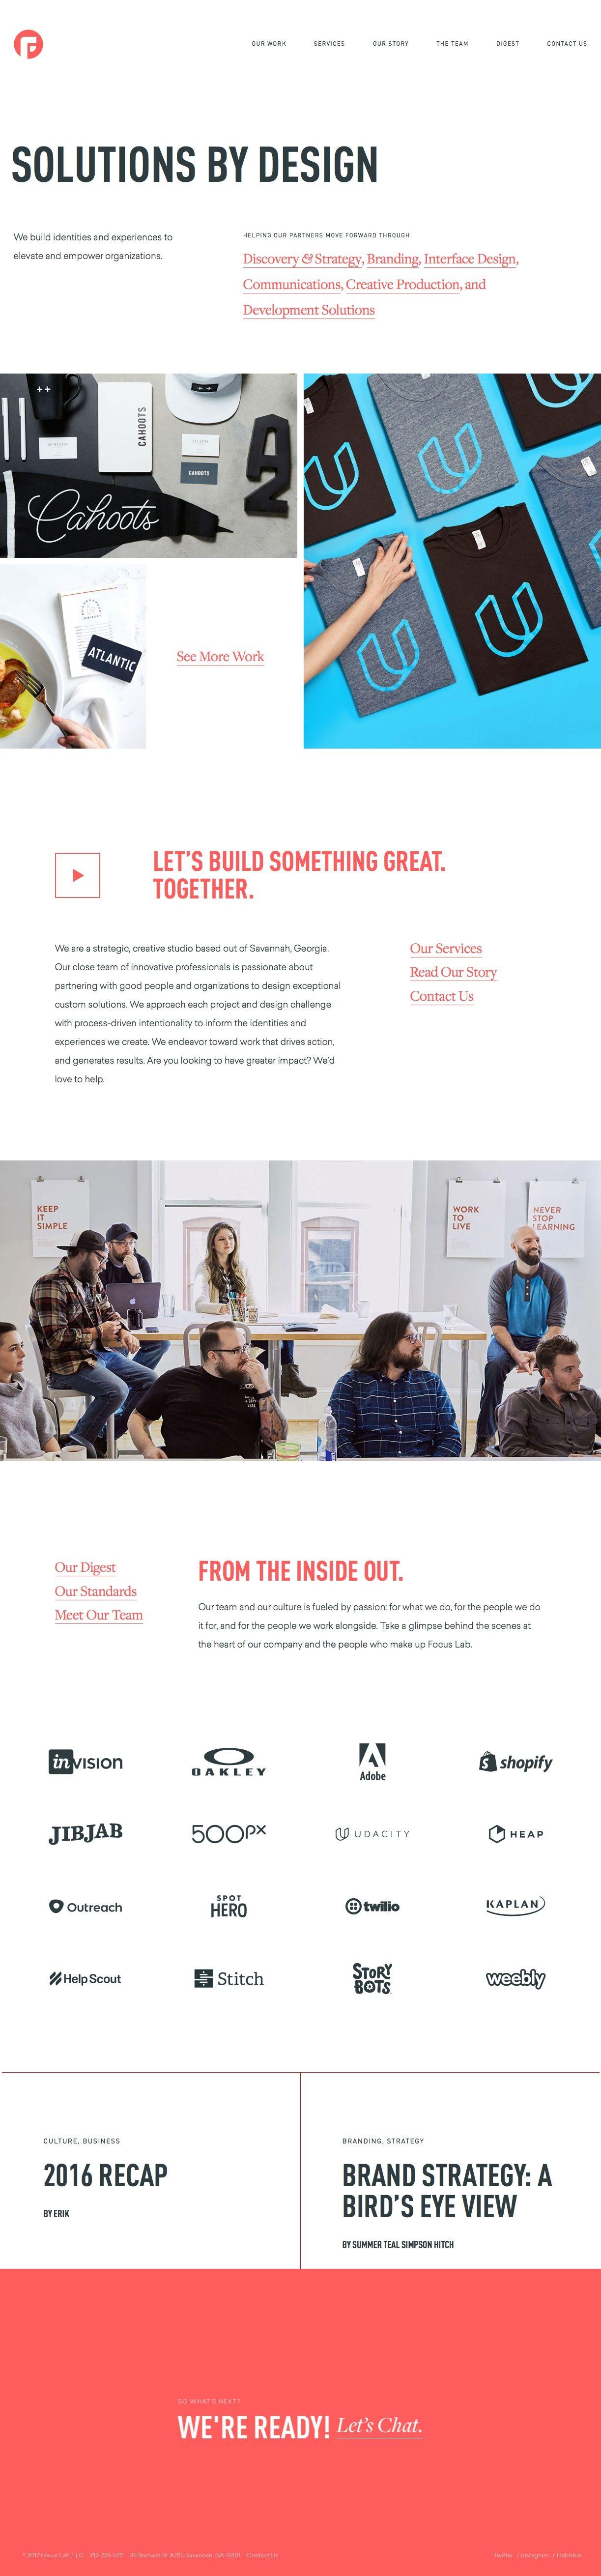 Focus Lab Solutions By Design Best Landing Page Design Design Web Design